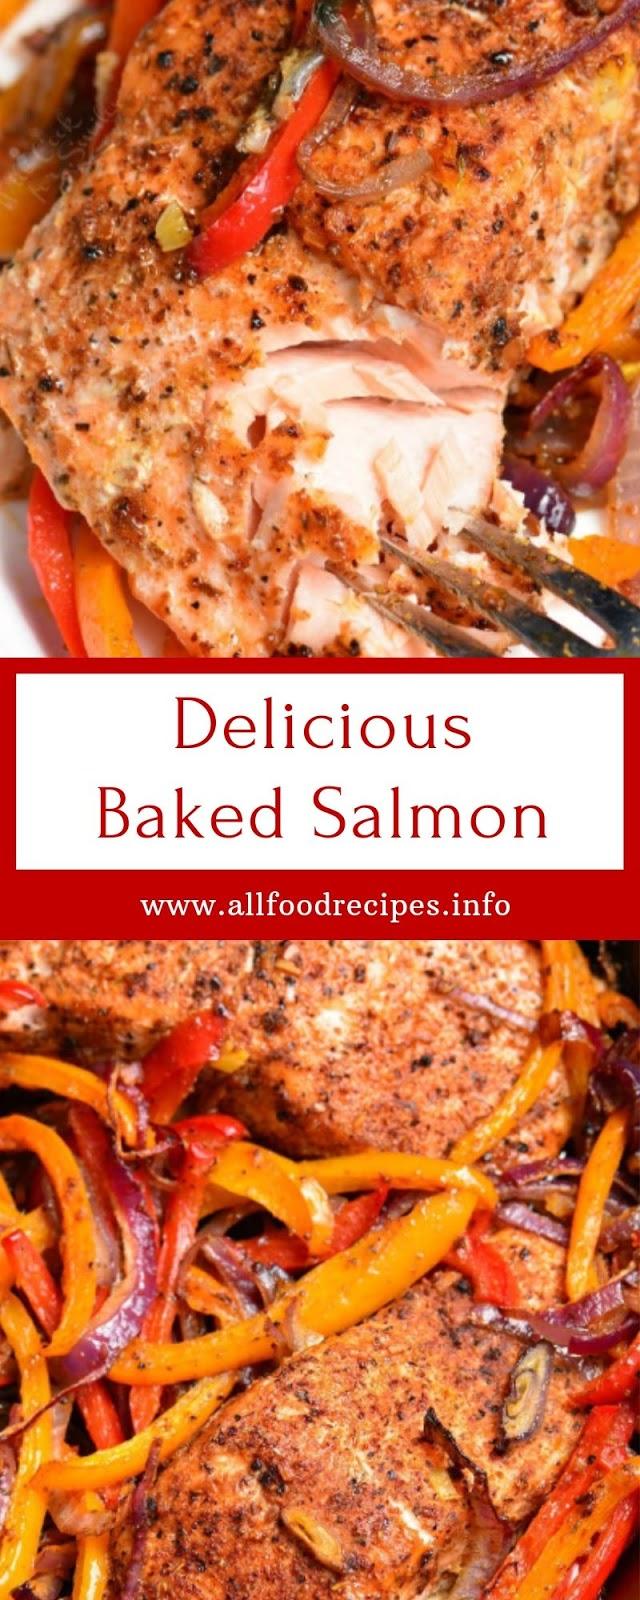 Delicious Baked Salmon